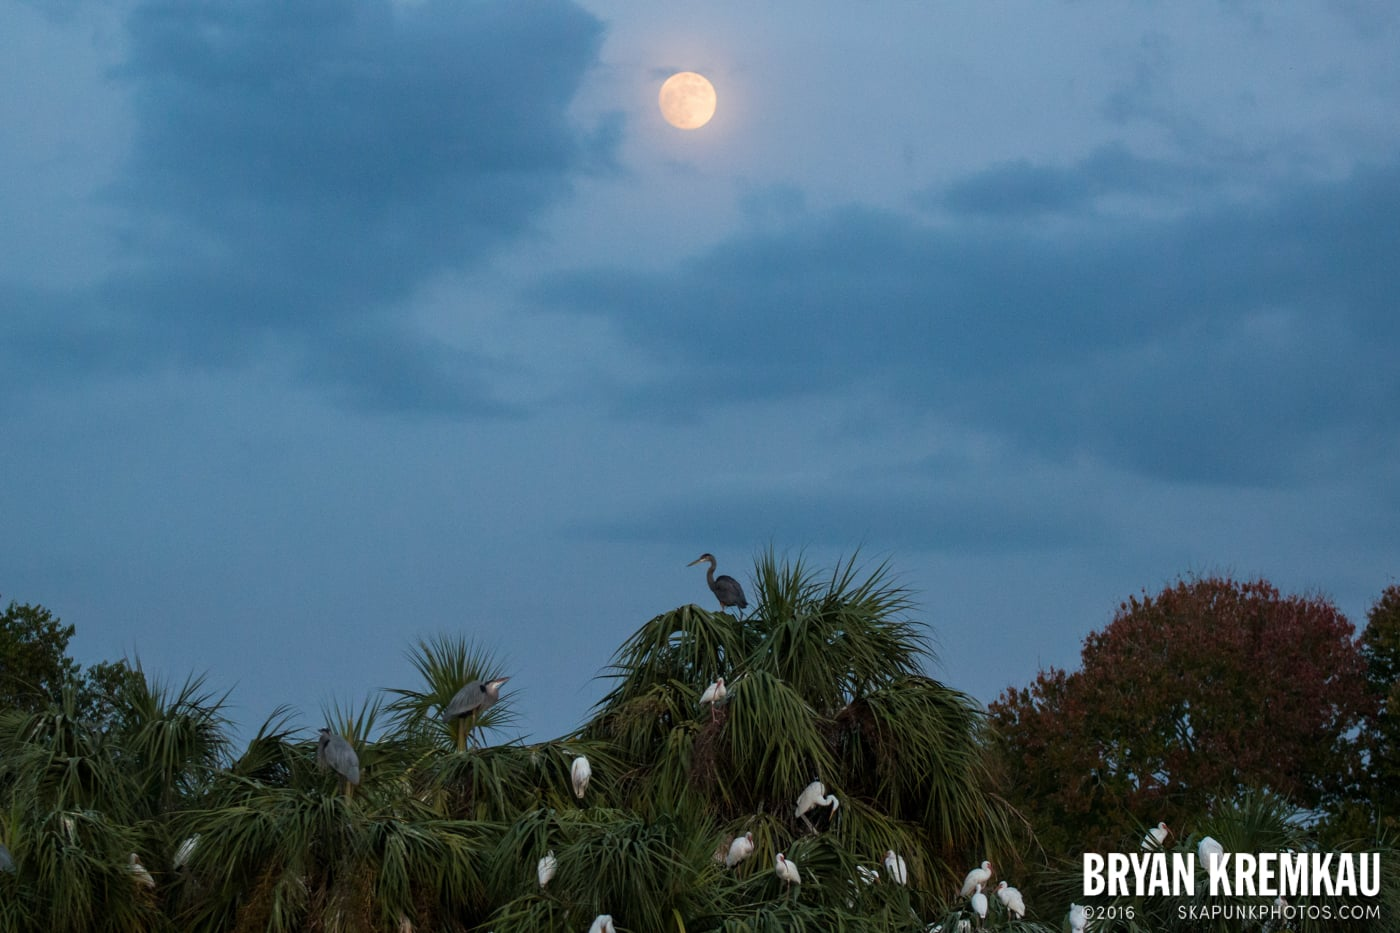 Sunsets, Astrophotography & Birds @ Venice, Florida - 10.25.14 - 11.5.14 (9)